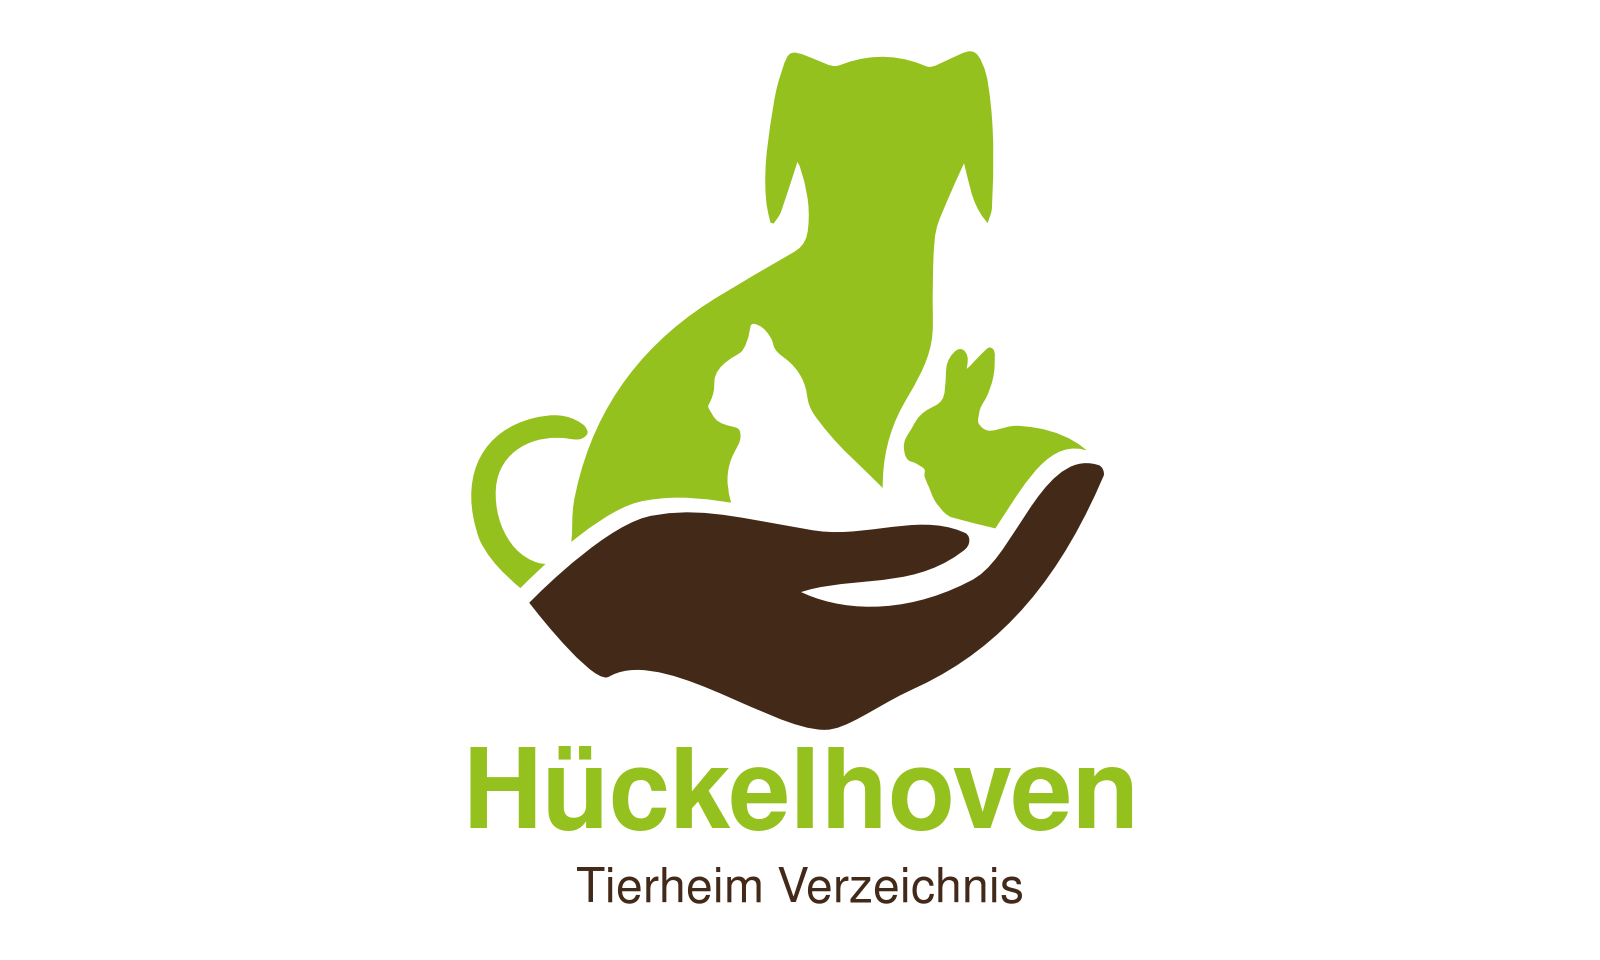 Tierheim Hückelhoven